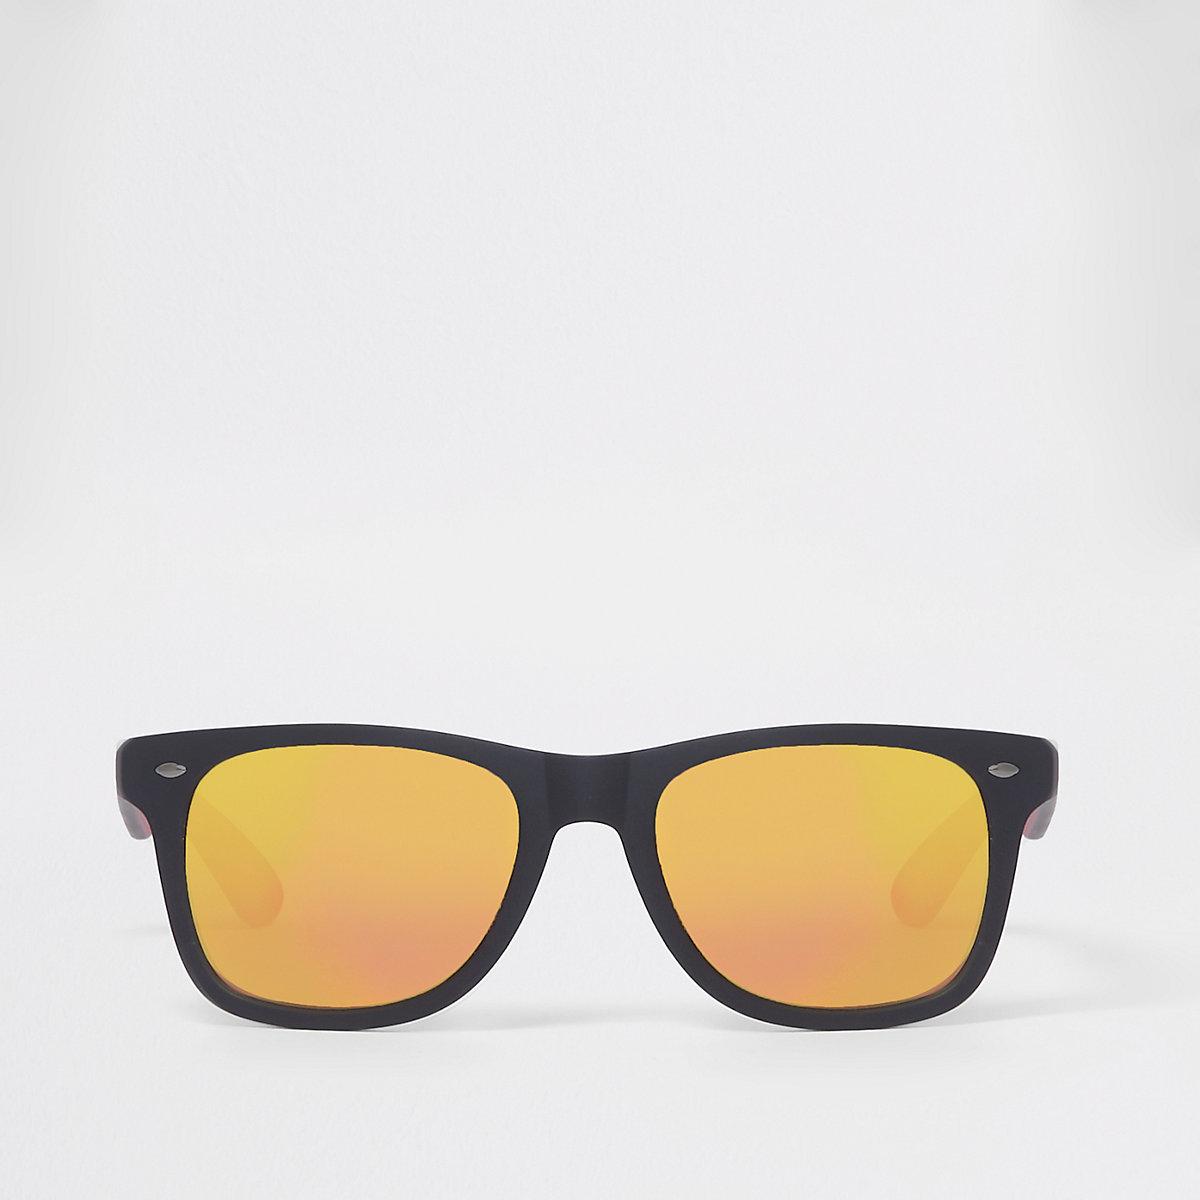 Black red lens retro square sunglasses